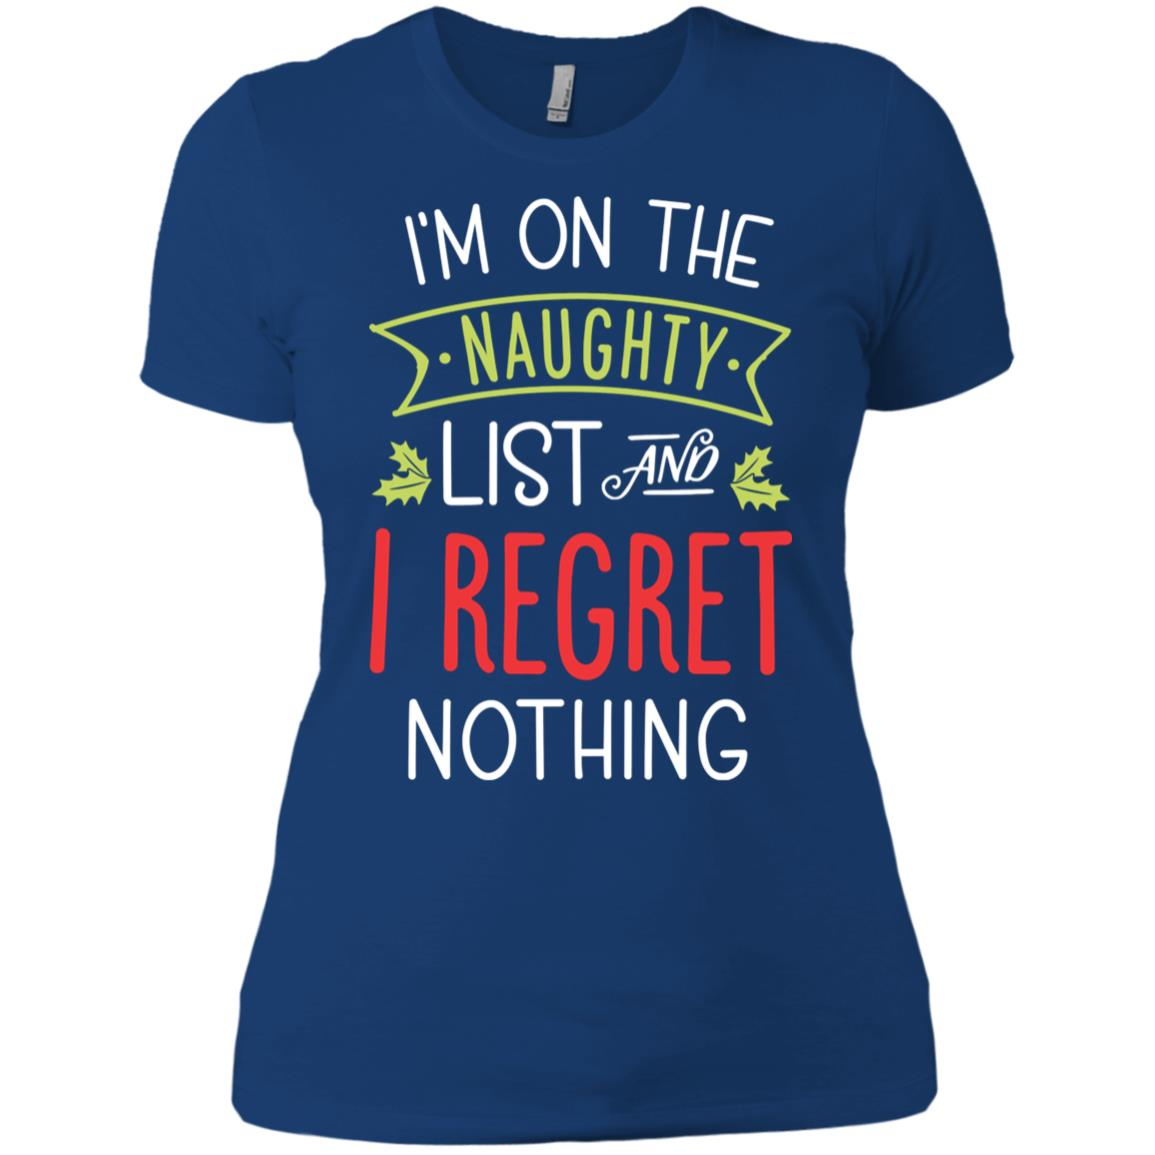 I'm on the Naughty List Christmas Funny Xmas Tee-1 Women Short Sleeve